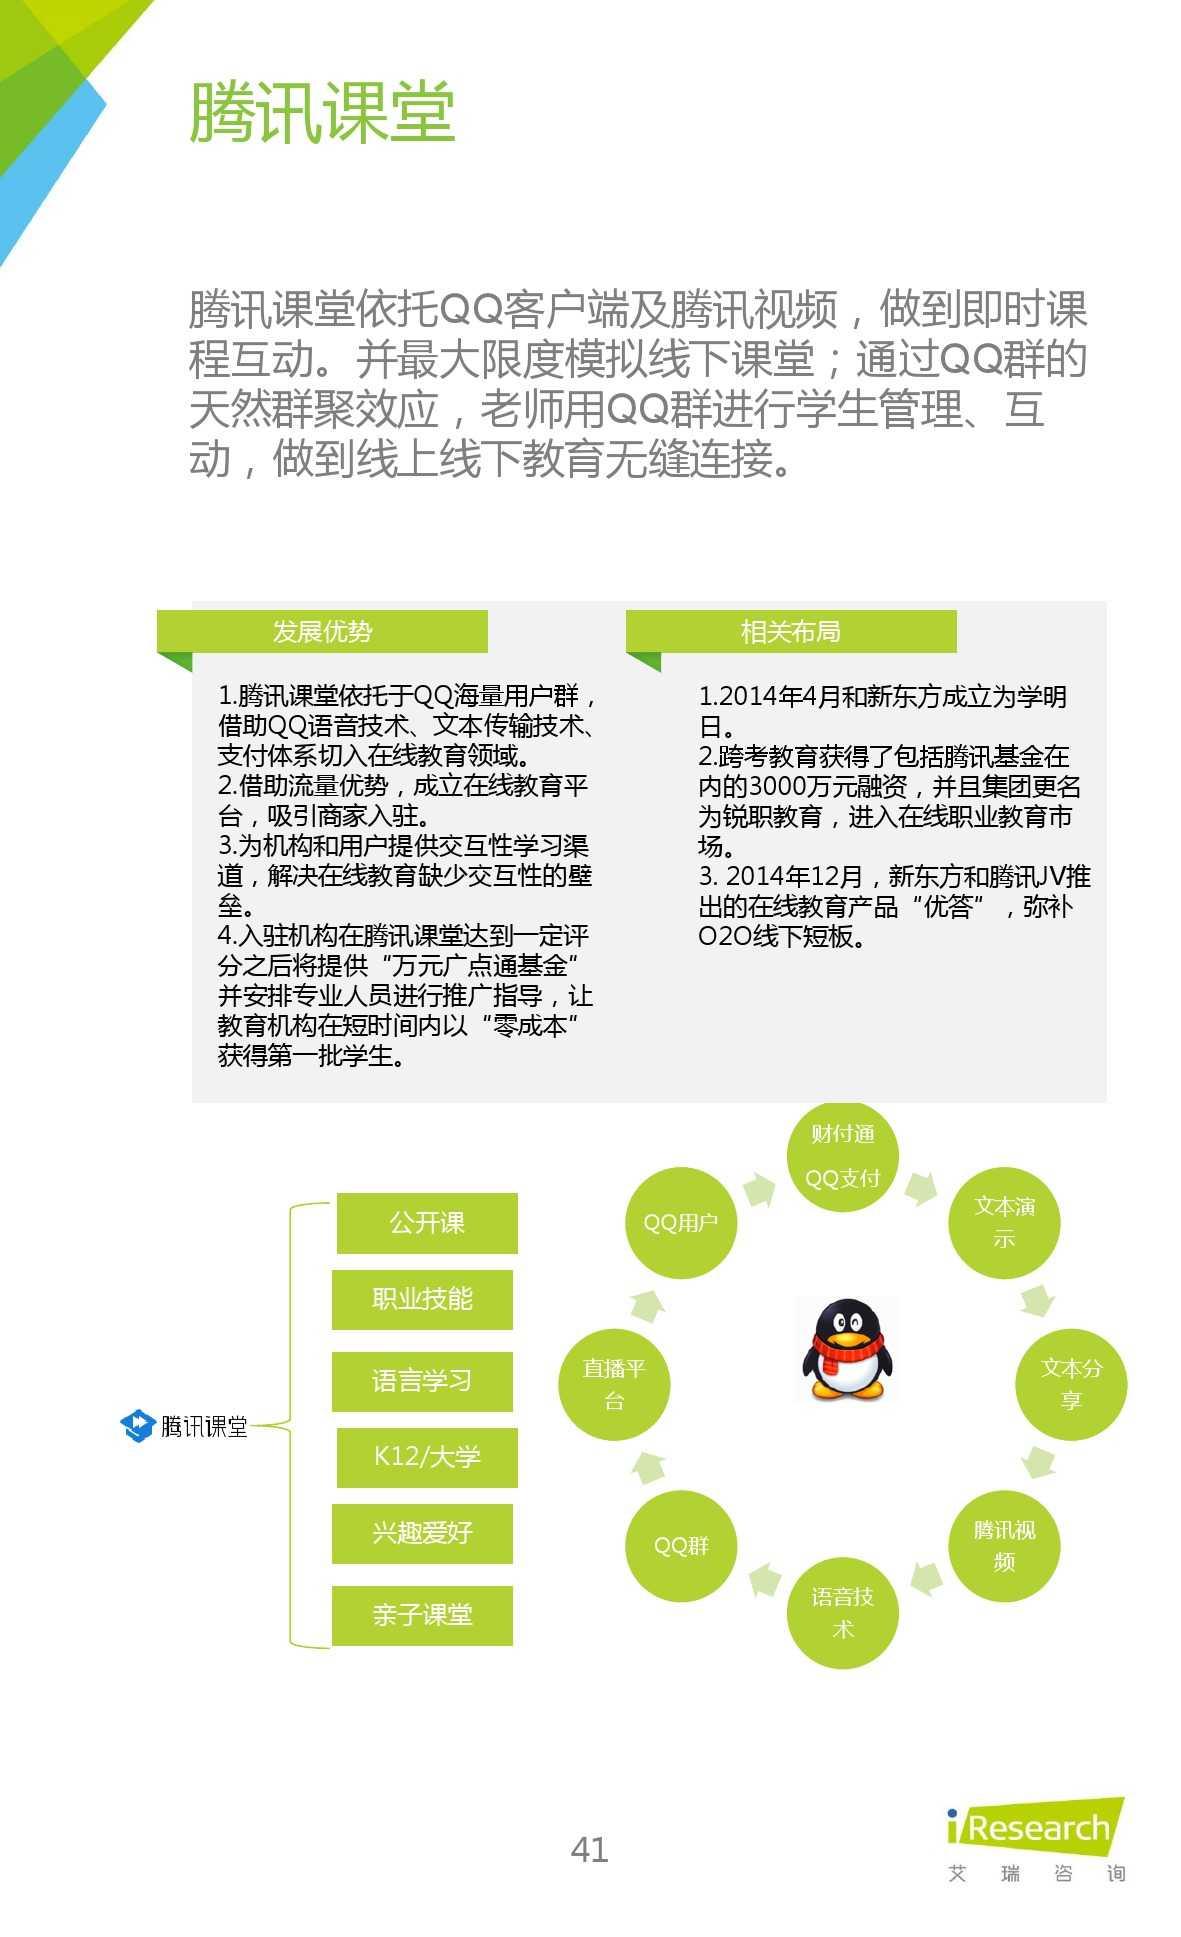 iResearch-2015年中国在线教育平台研究报告_000041